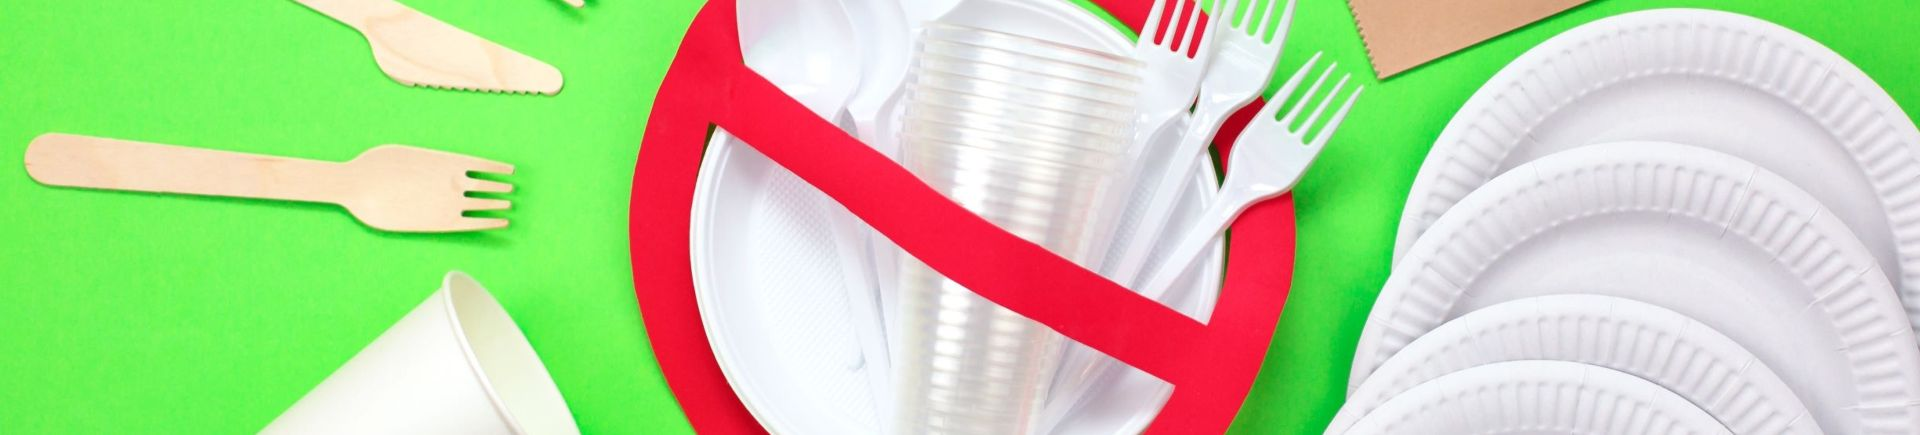 single-use plastic products-2